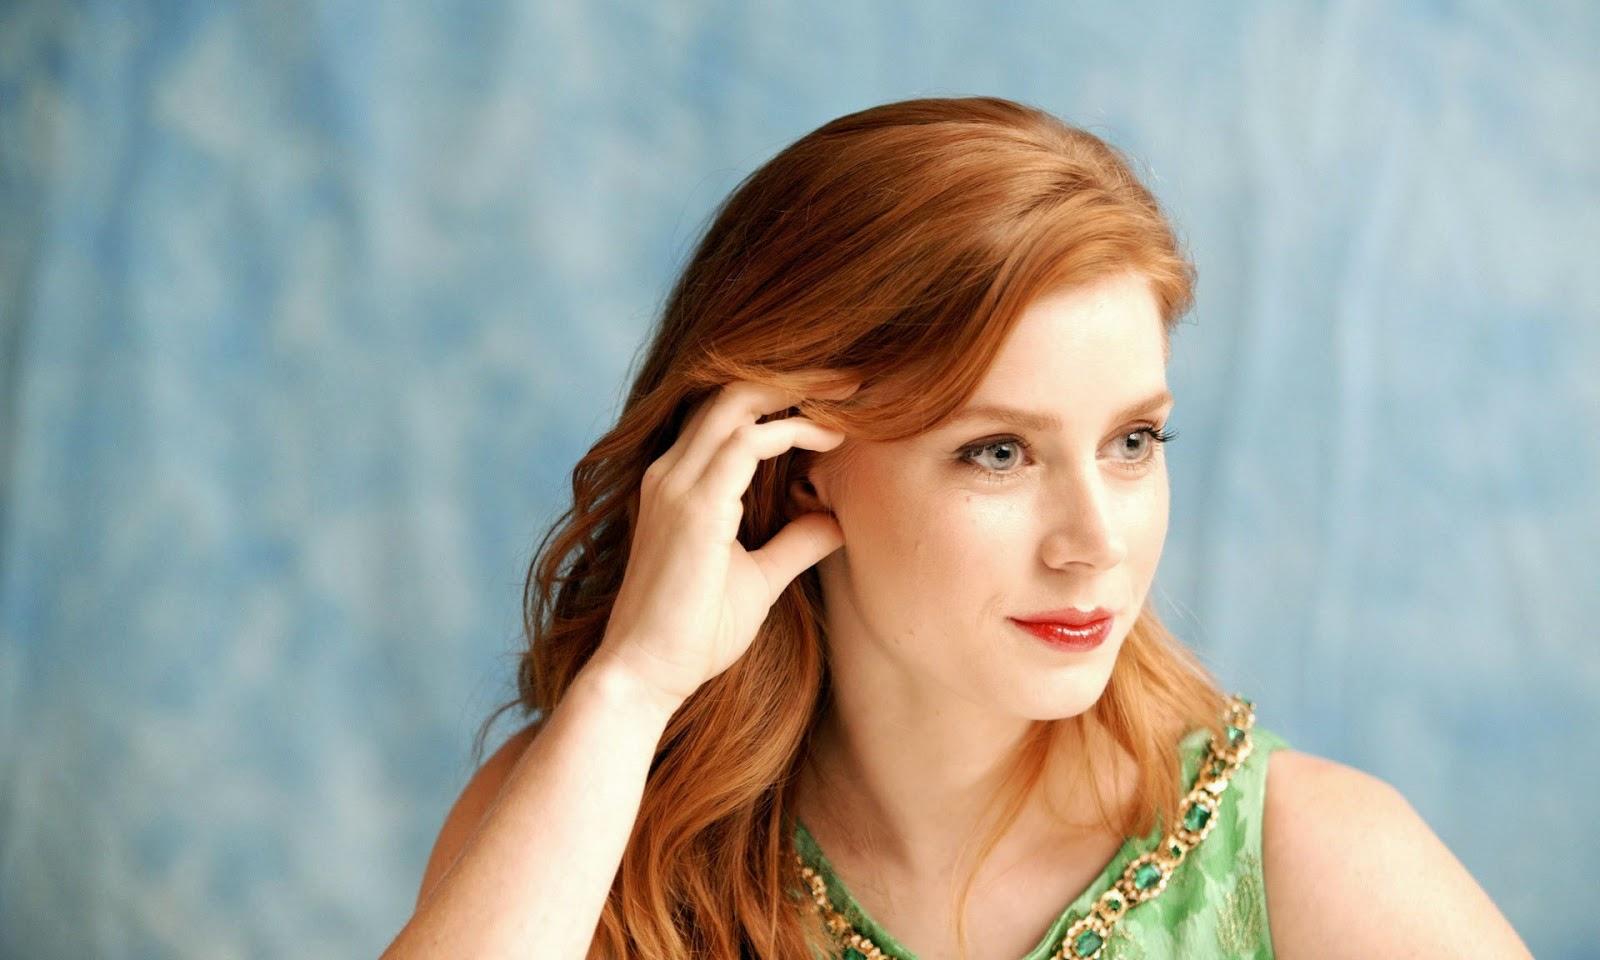 Amy adams hot actress HD images